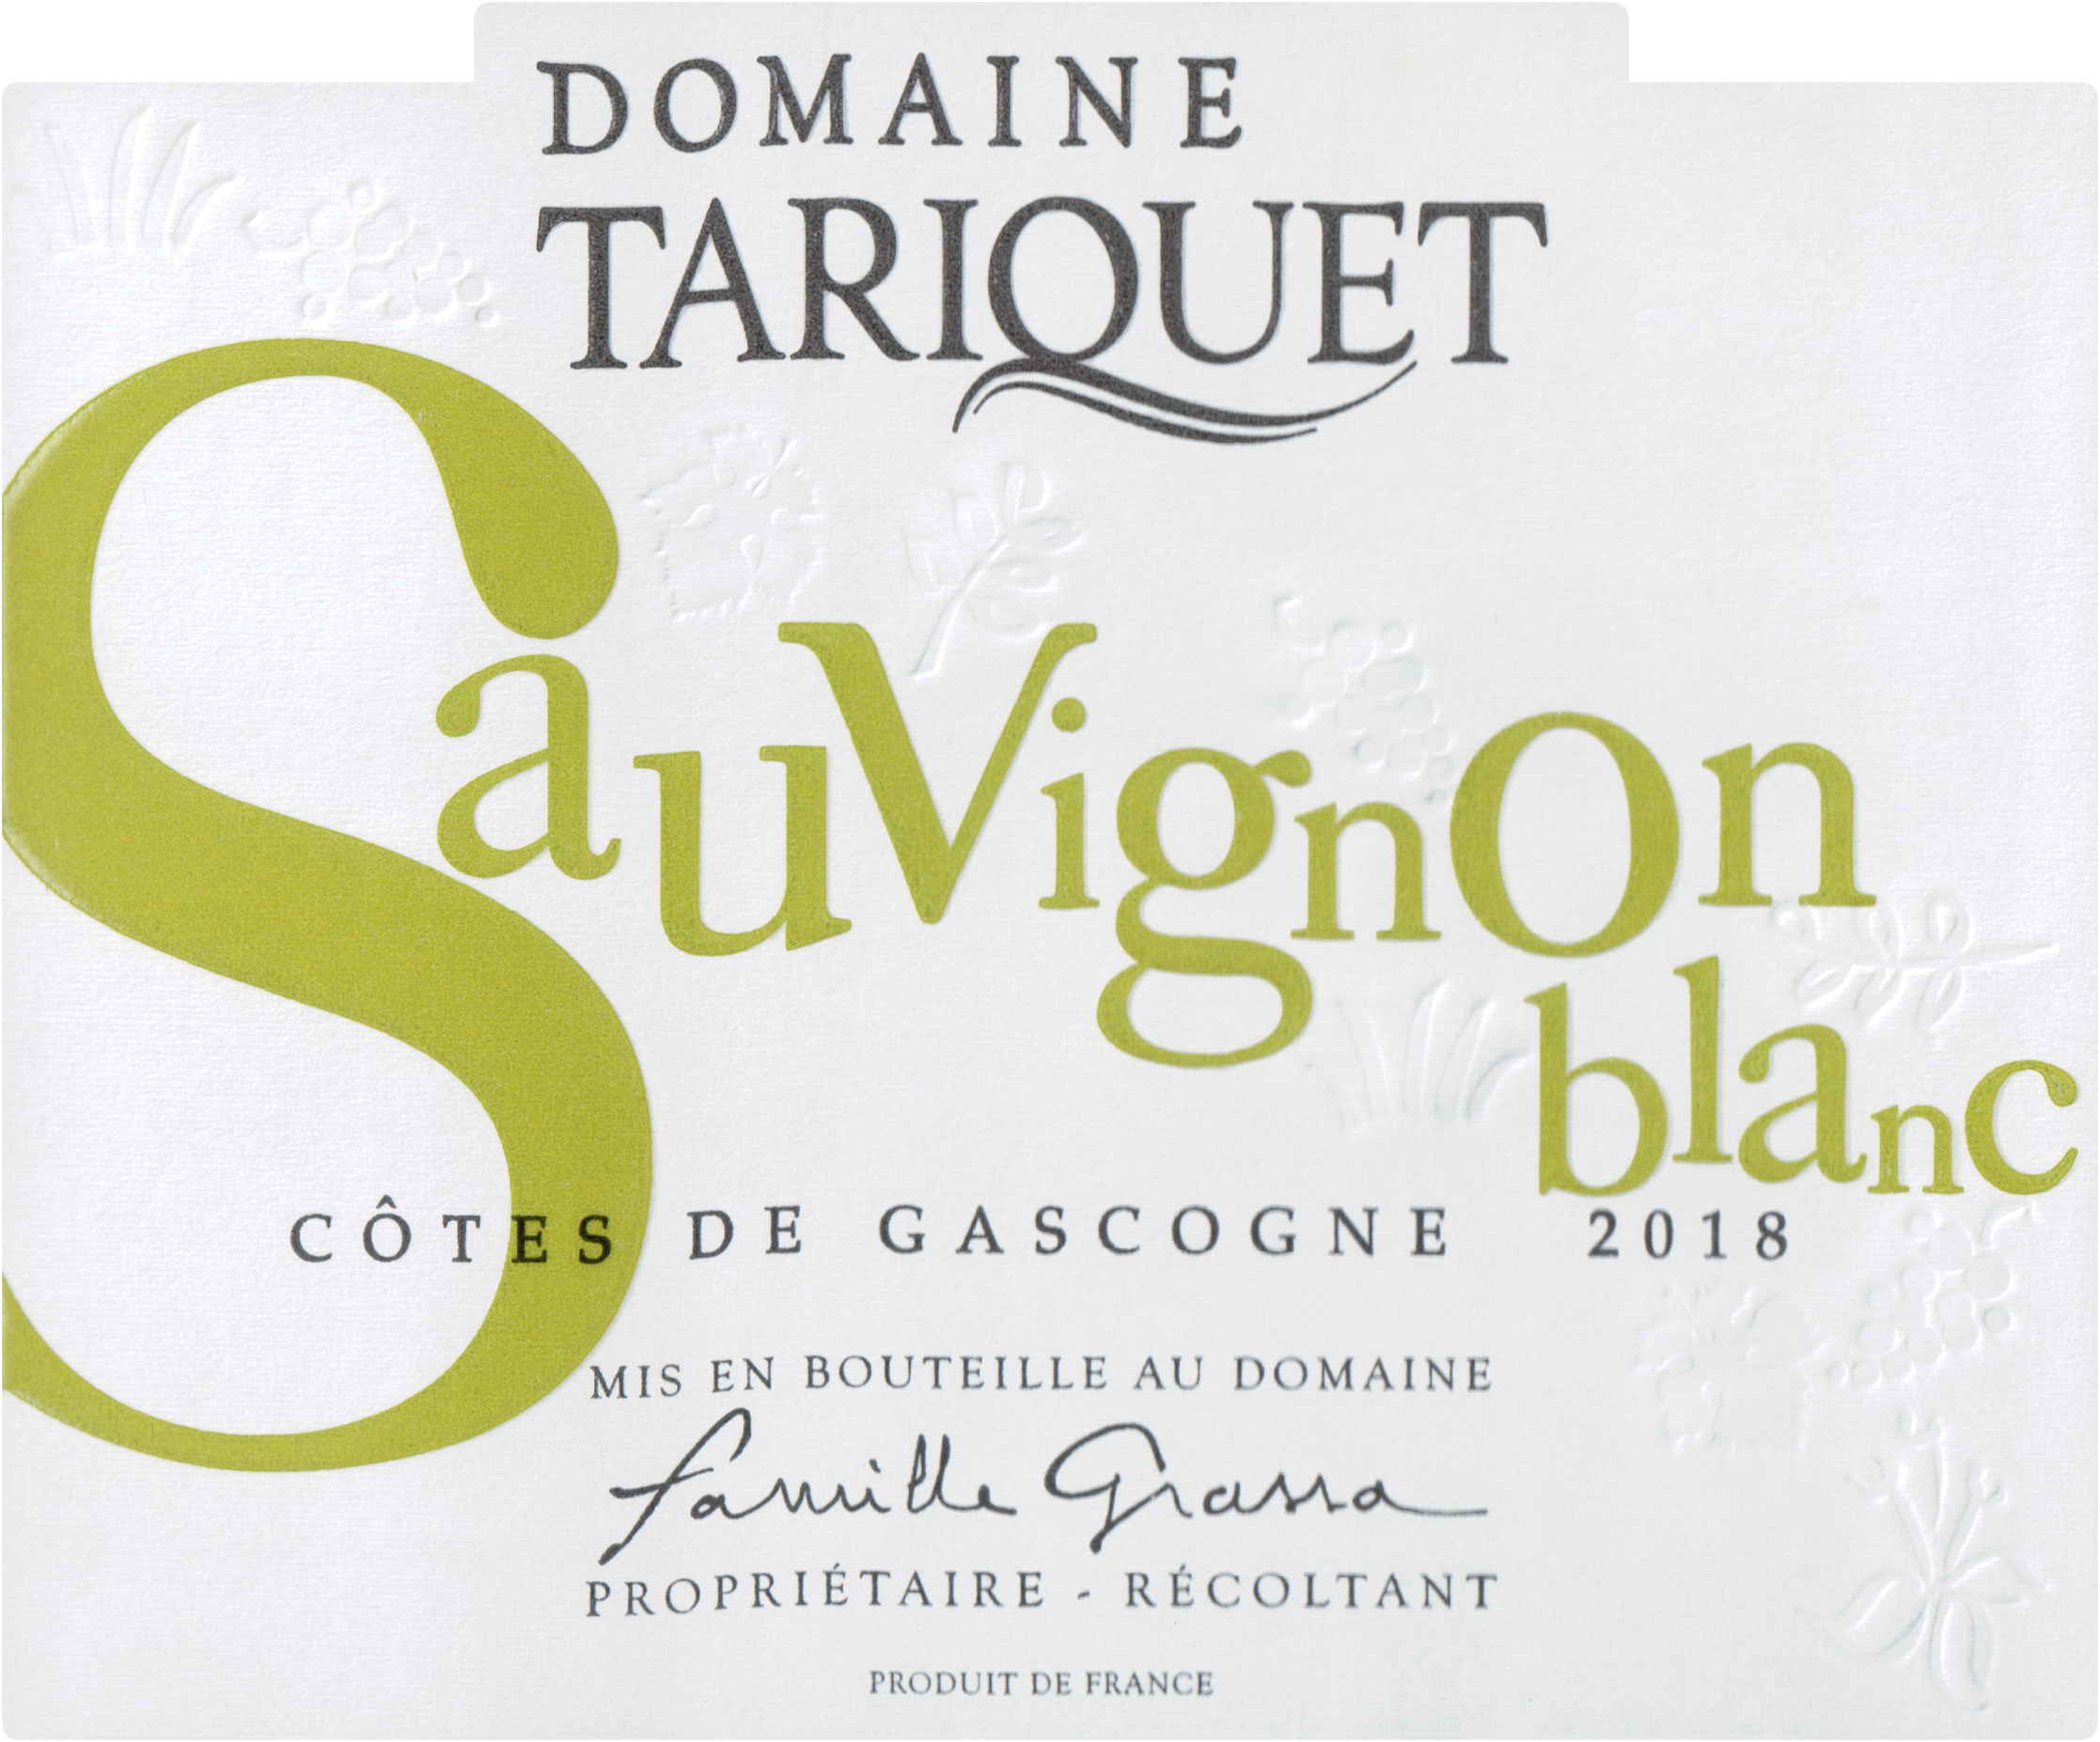 Domaine Tariquet Sauvignon Blanc 2018